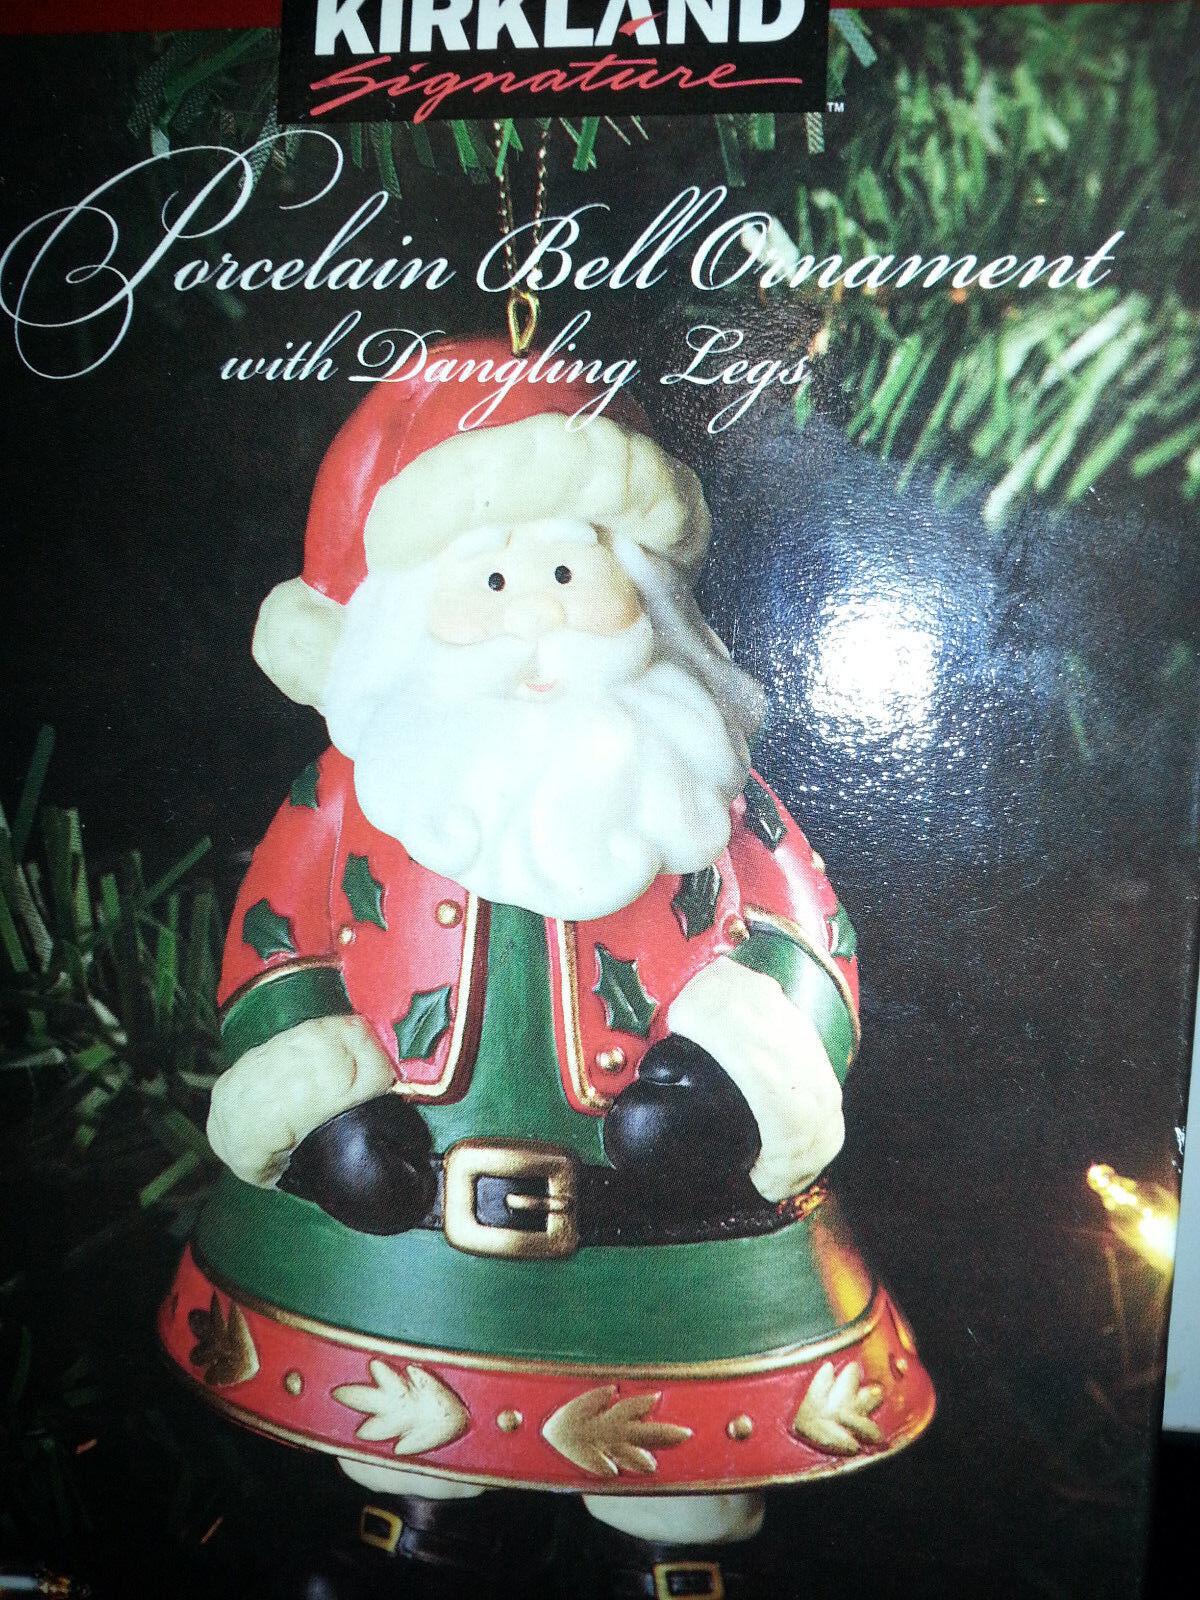 Kirkland Porcelain Christmas Elf Bell Ornament With Dangling Legs ...